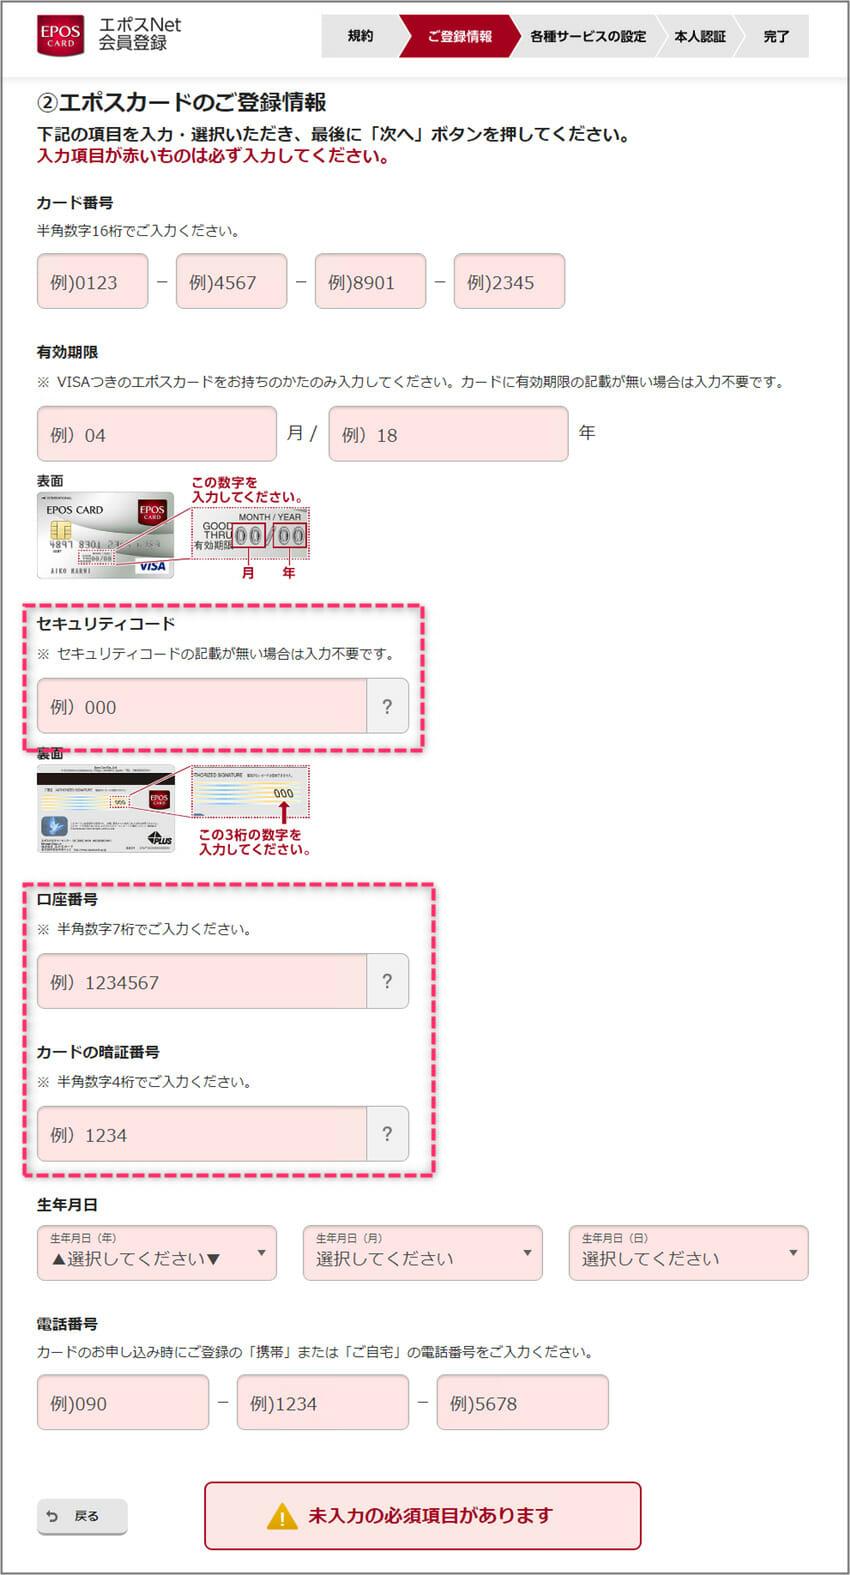 EPOSカードの個人情報を盗み出す詐欺サイト